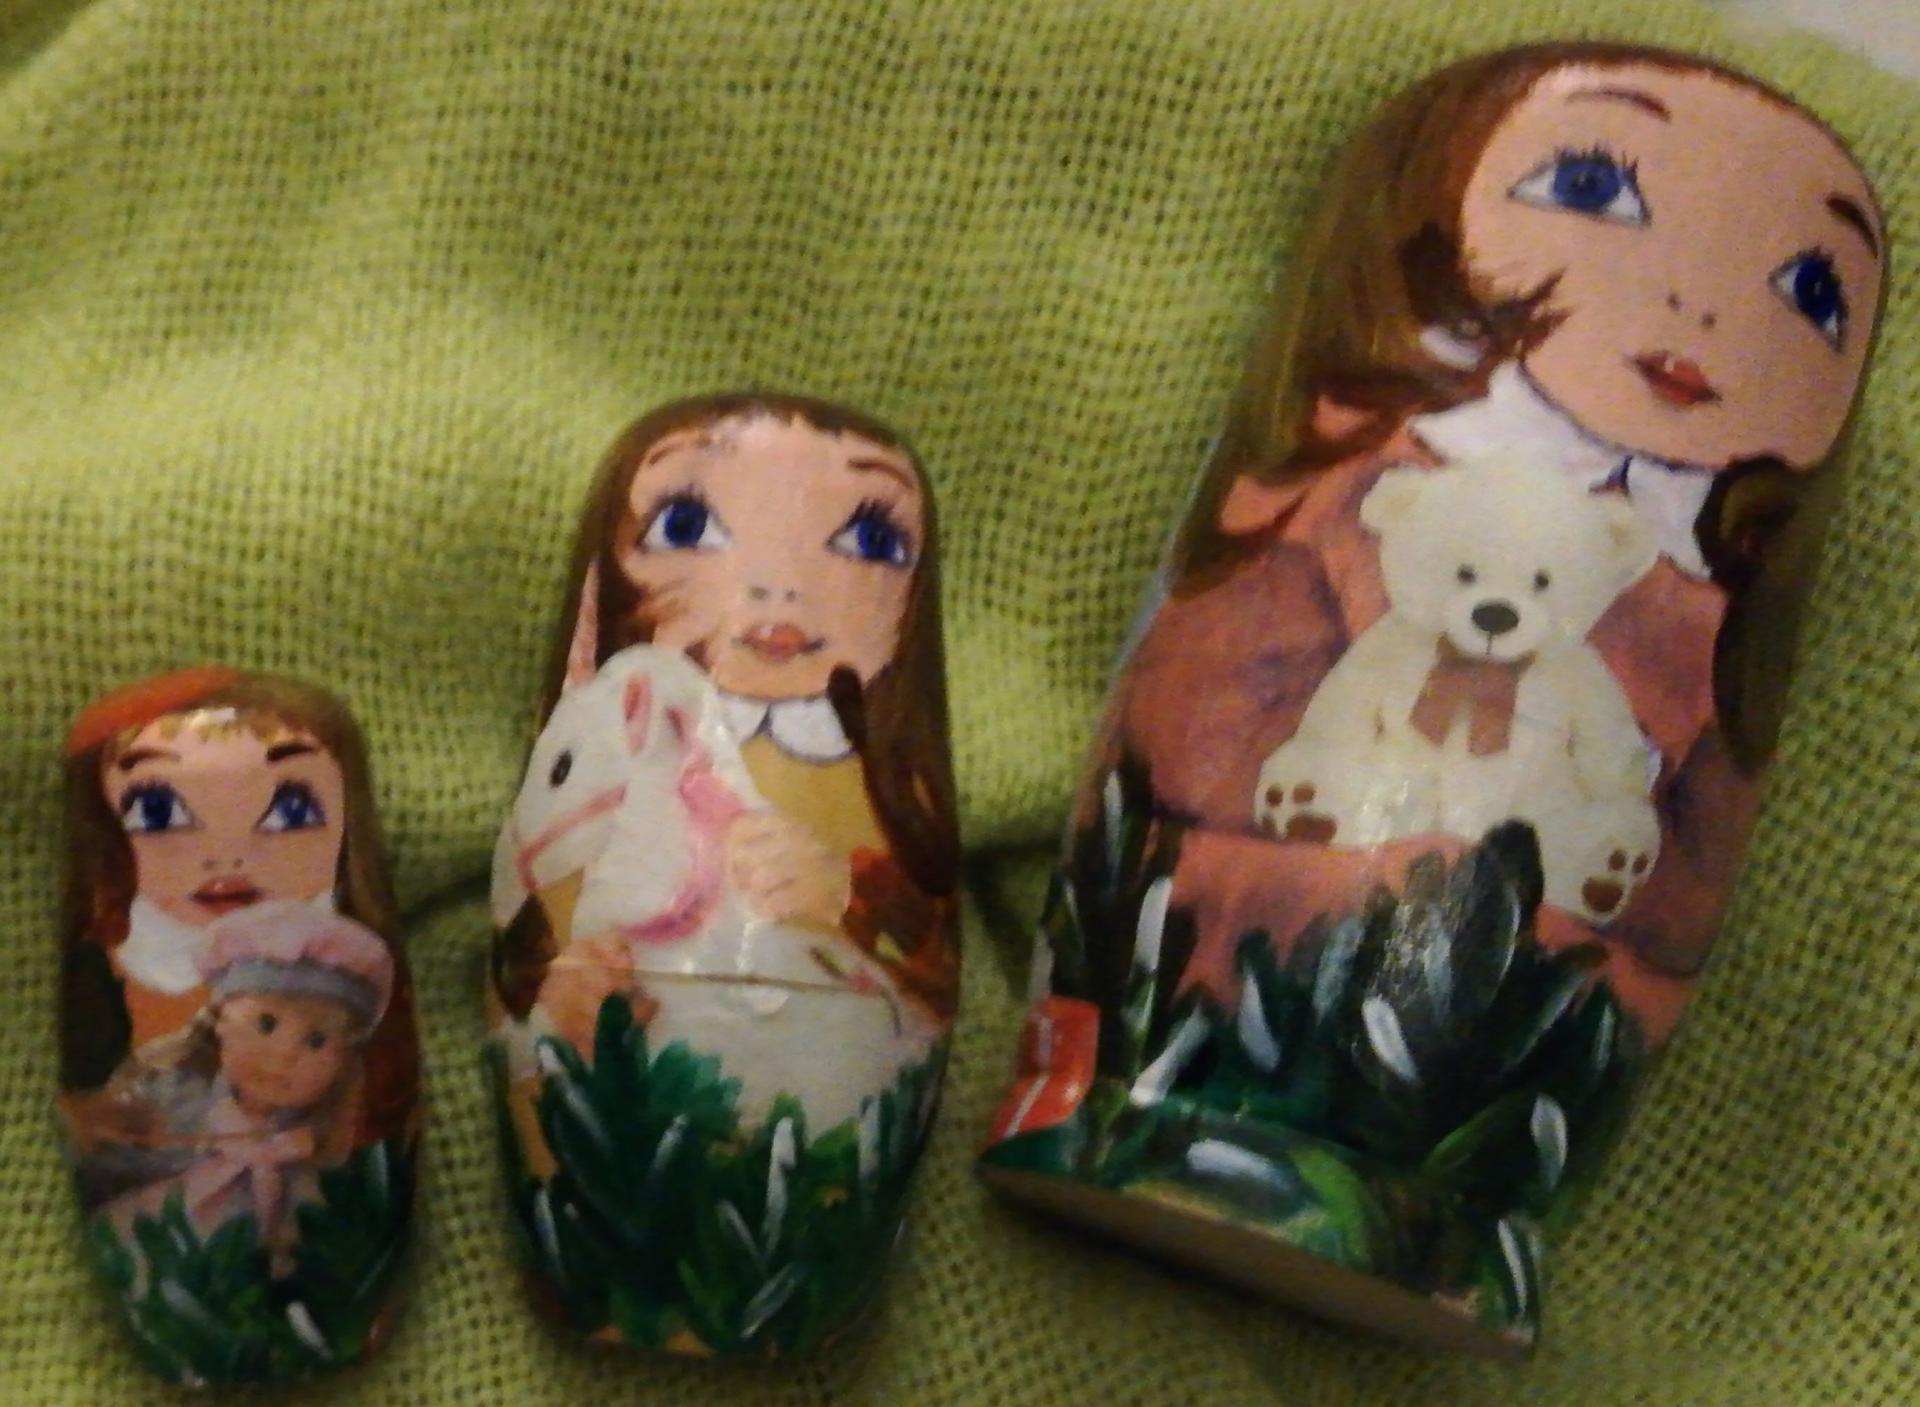 Matriochka ania devant l arbre de noel 6 matriochkas peintes a la main dorures et illustrations sur bois de peuplier fifi au jardin pose 5